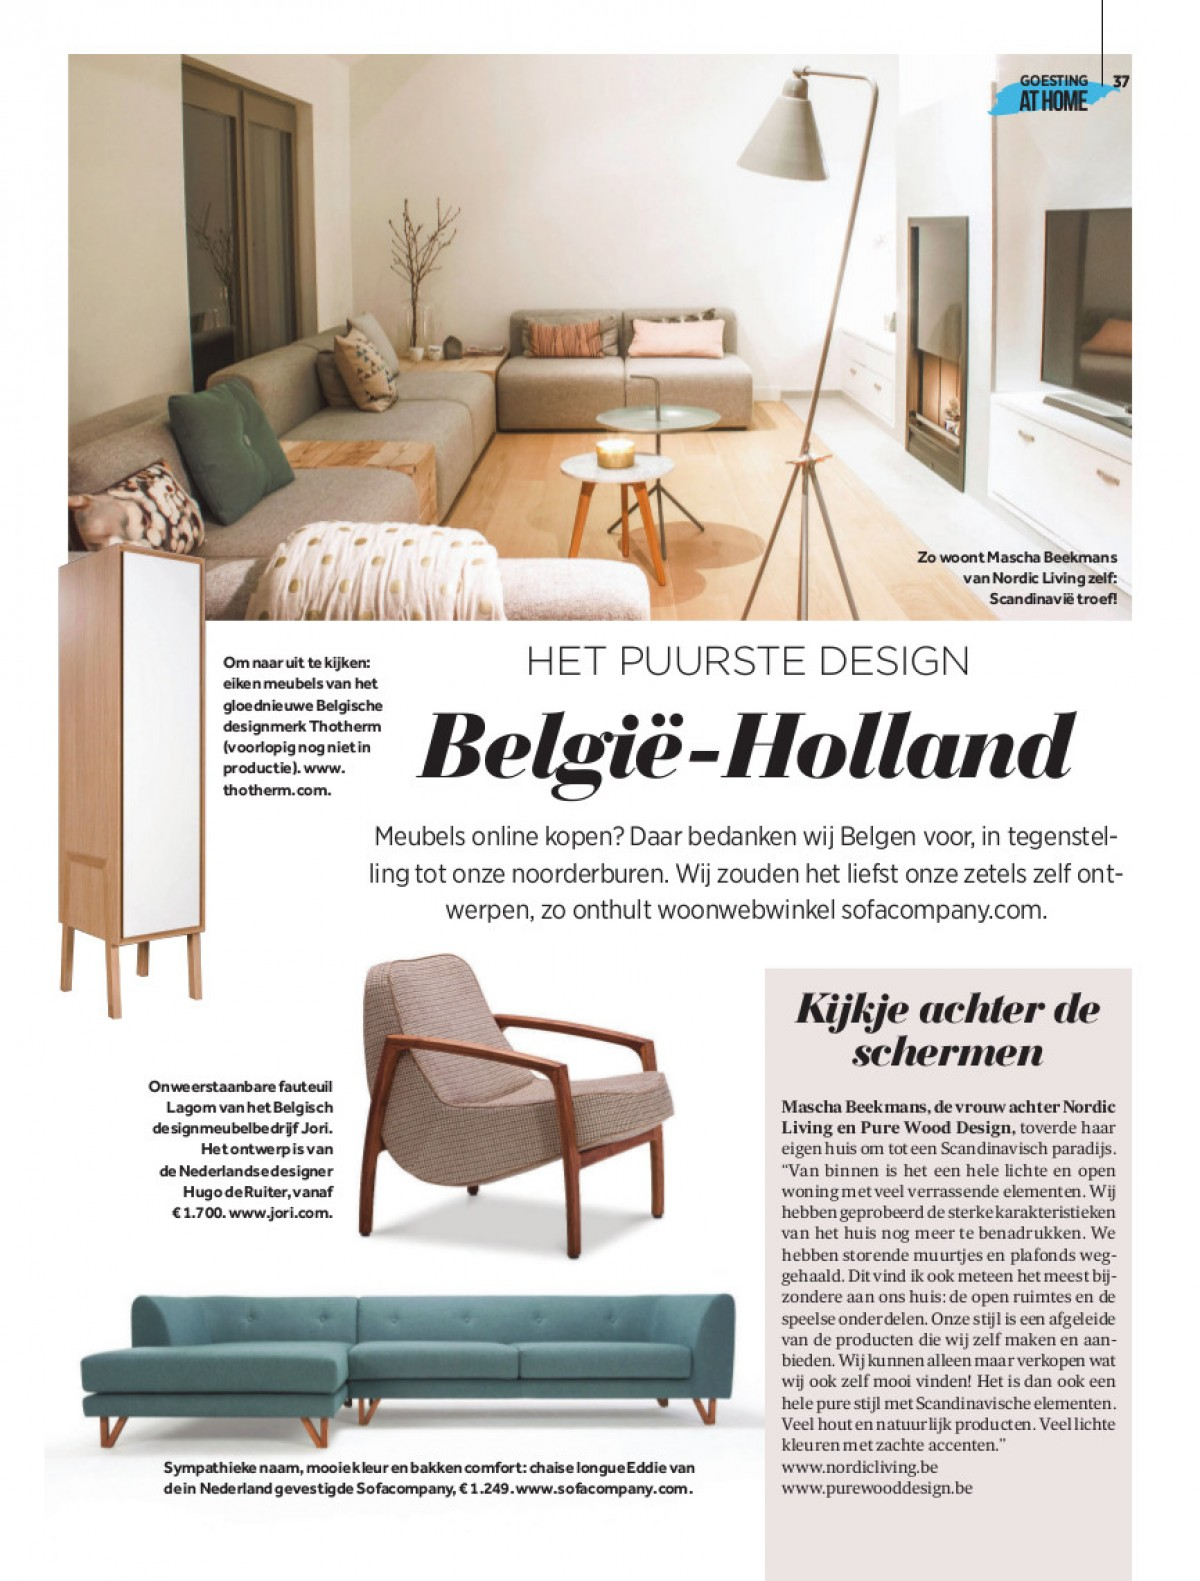 Design Fauteuil Jori.Goesting At Home Publications Design Furniture Jori